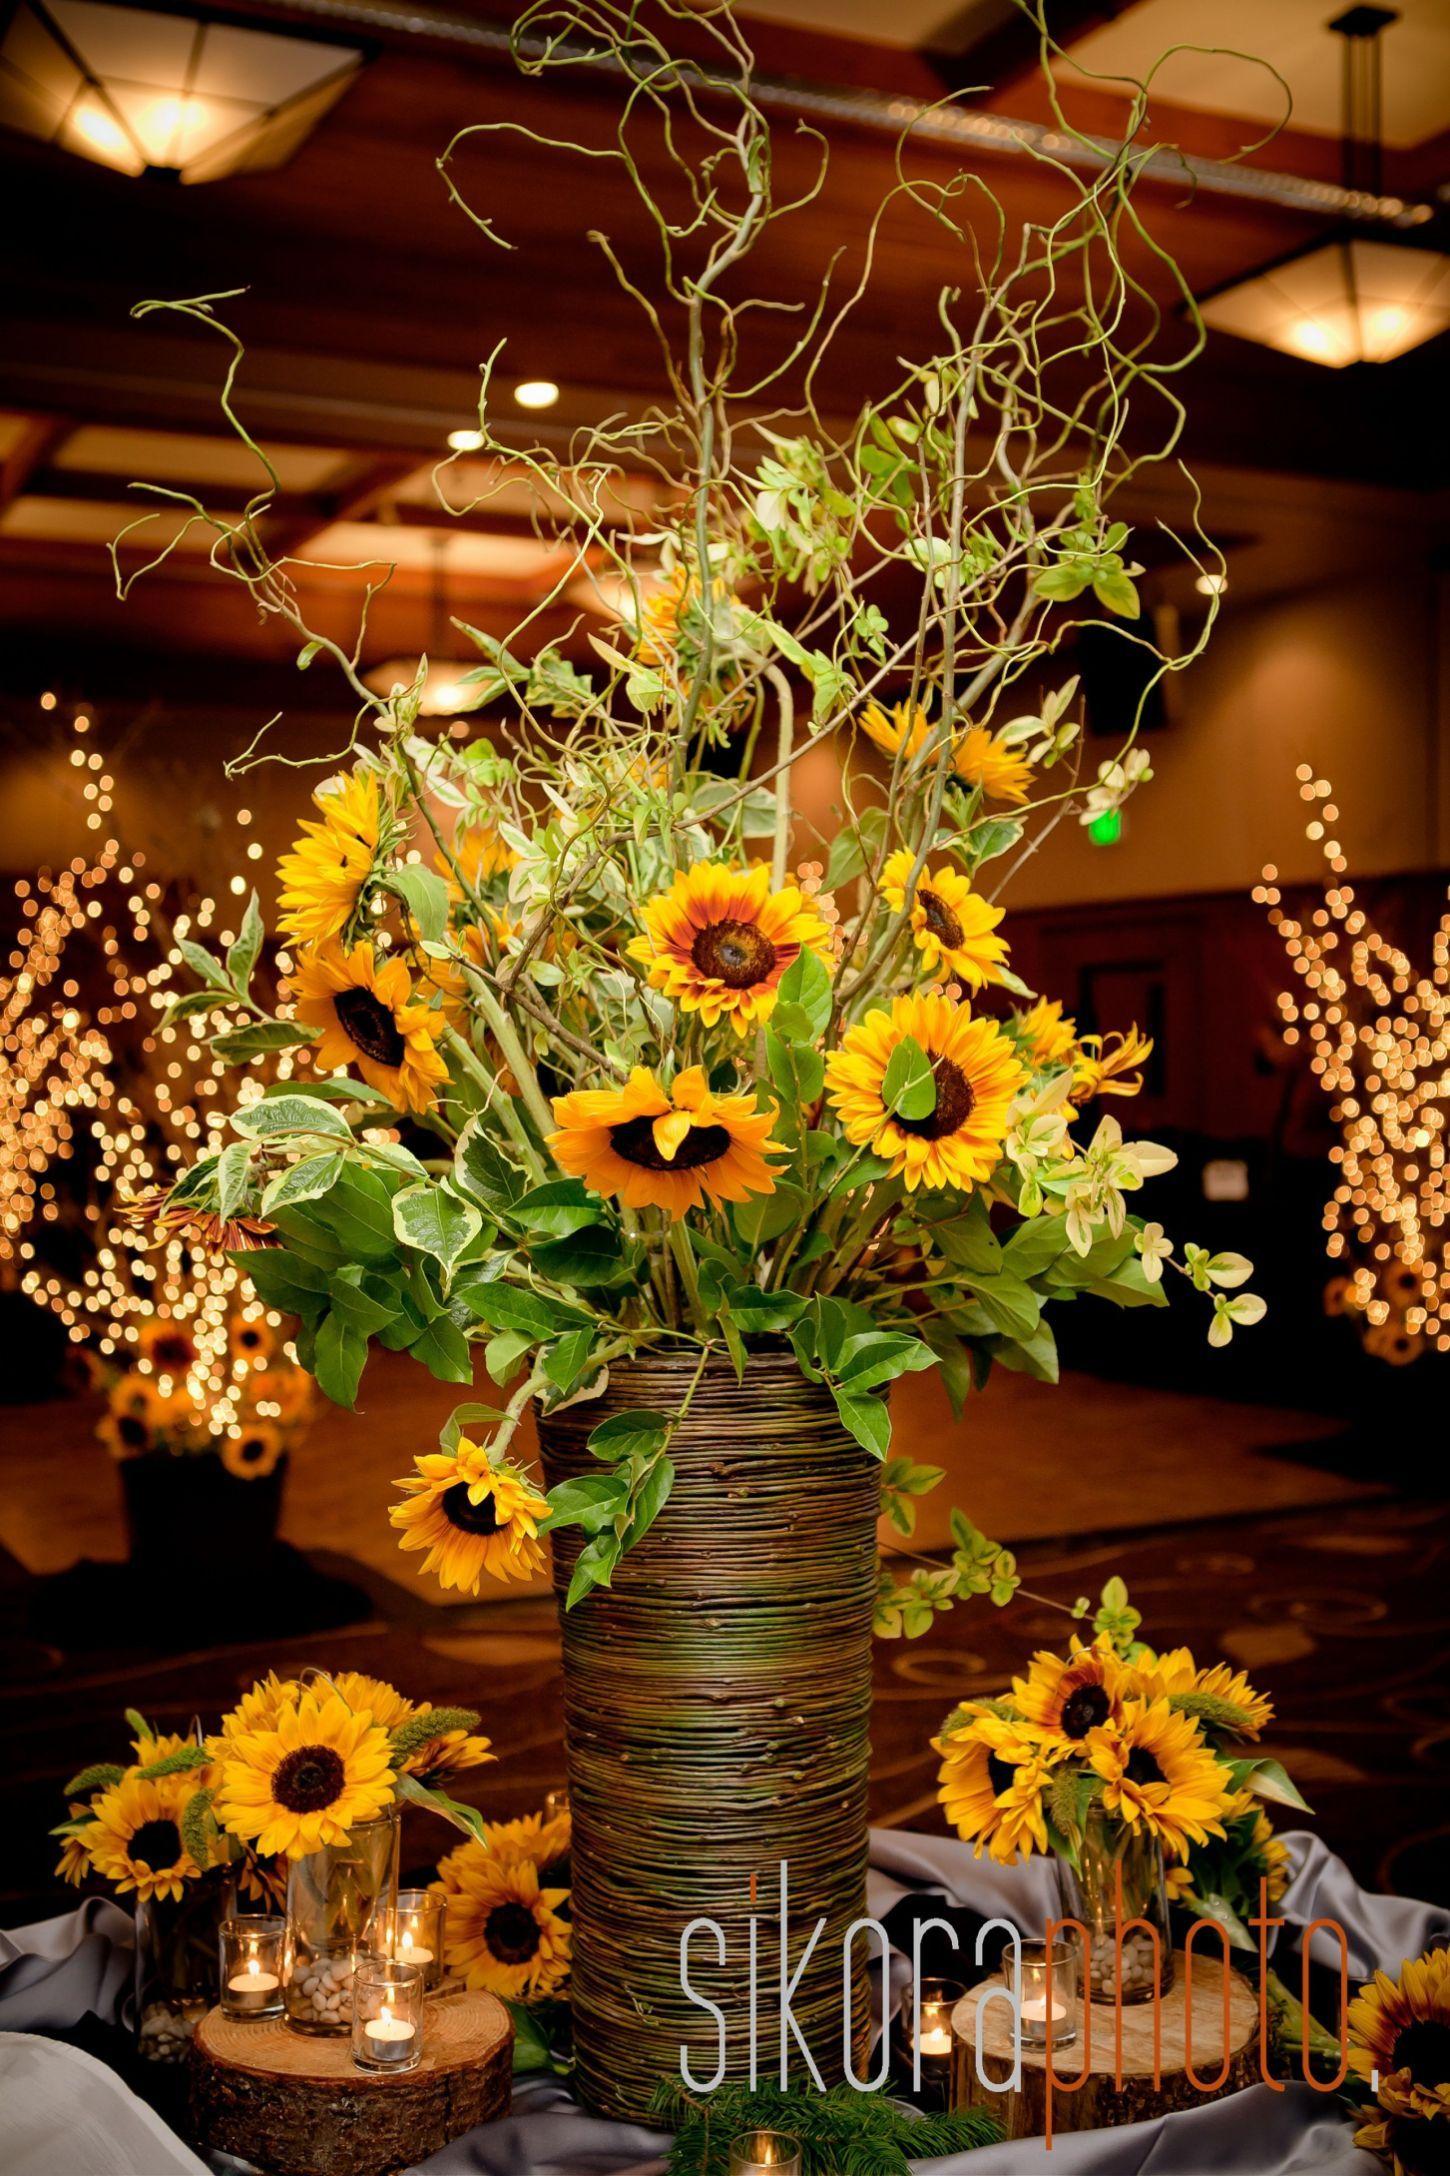 50+ Beautiful Sunflower Arrangement Center Pieces Easy To ...